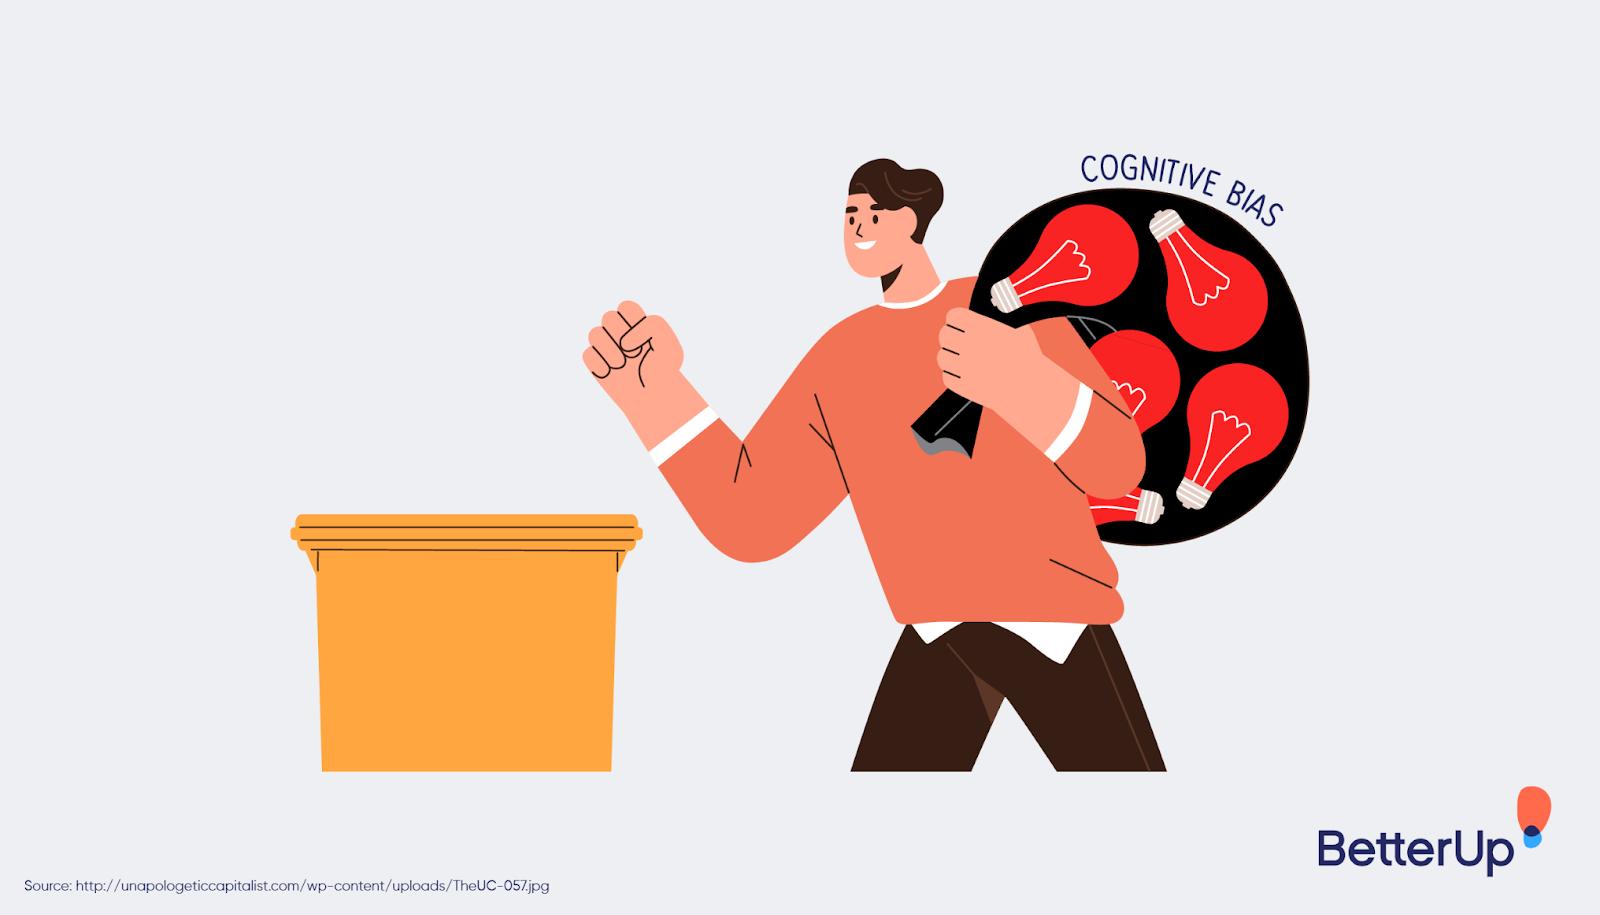 person-putting-cognitive-bias-into-a-trash-can-cognitive-bias